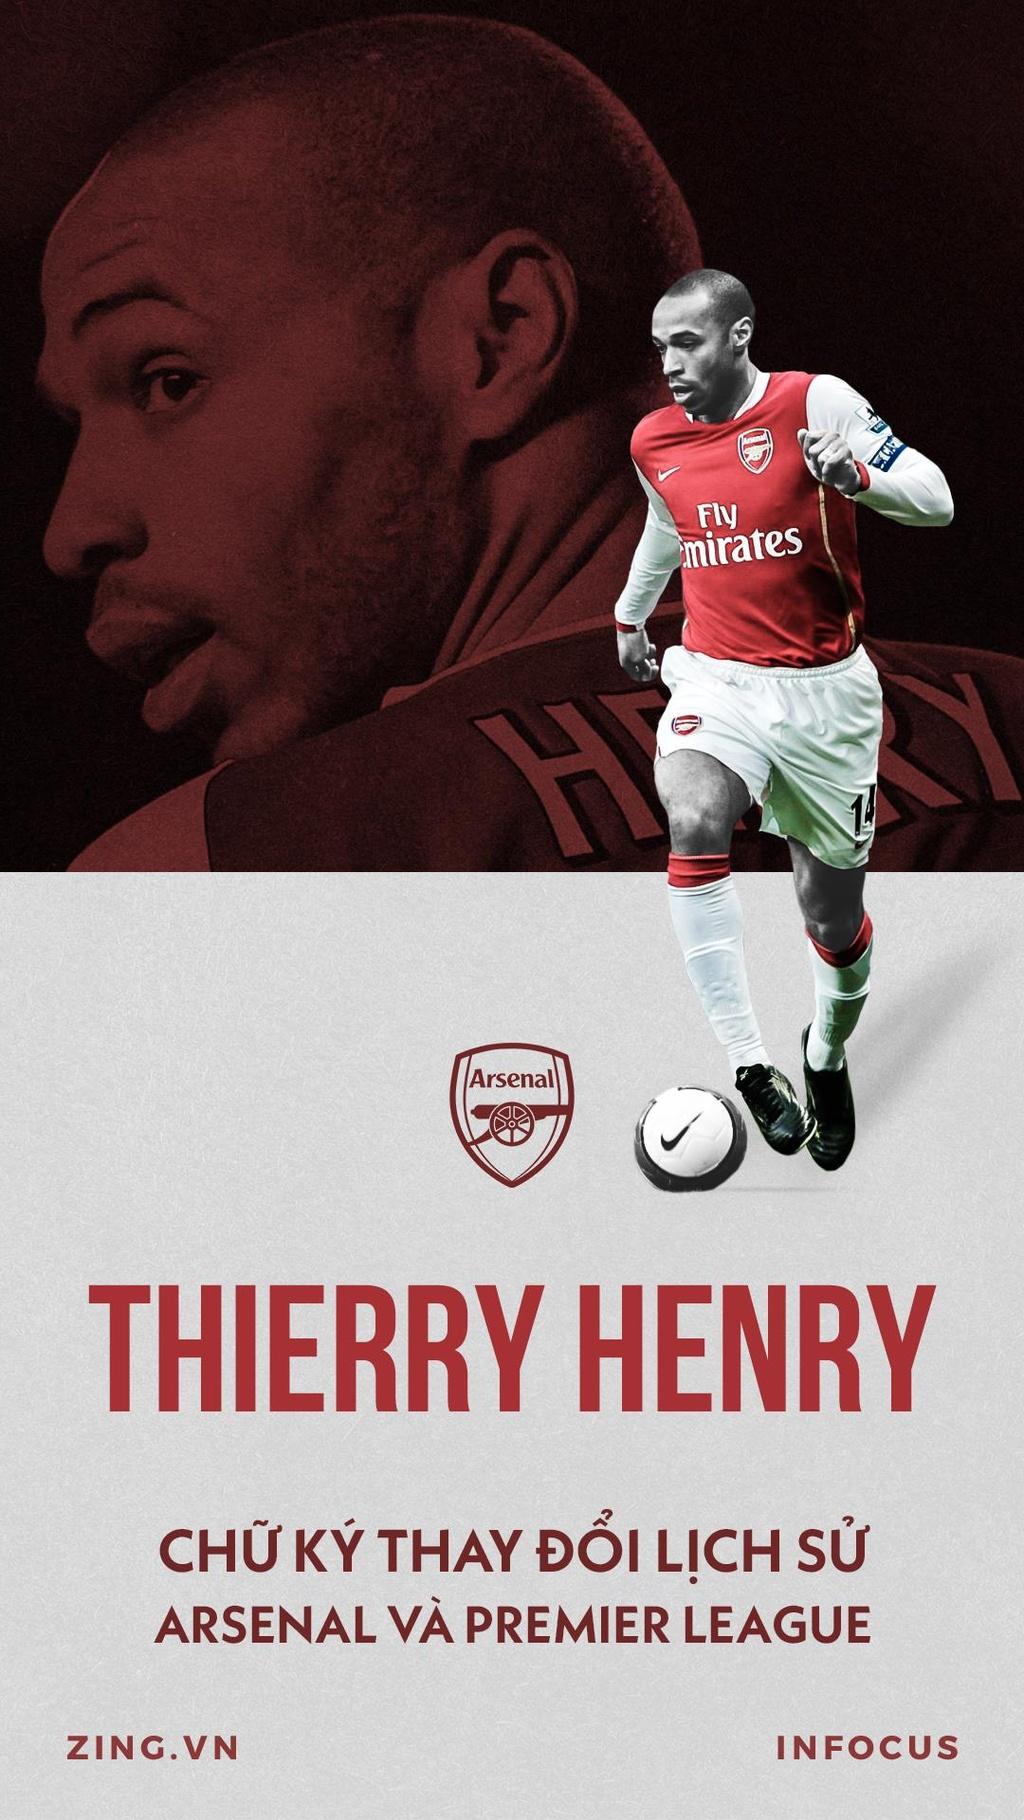 Thierry Henry - chu ky thay doi lich su Arsenal va Premier League hinh anh 1